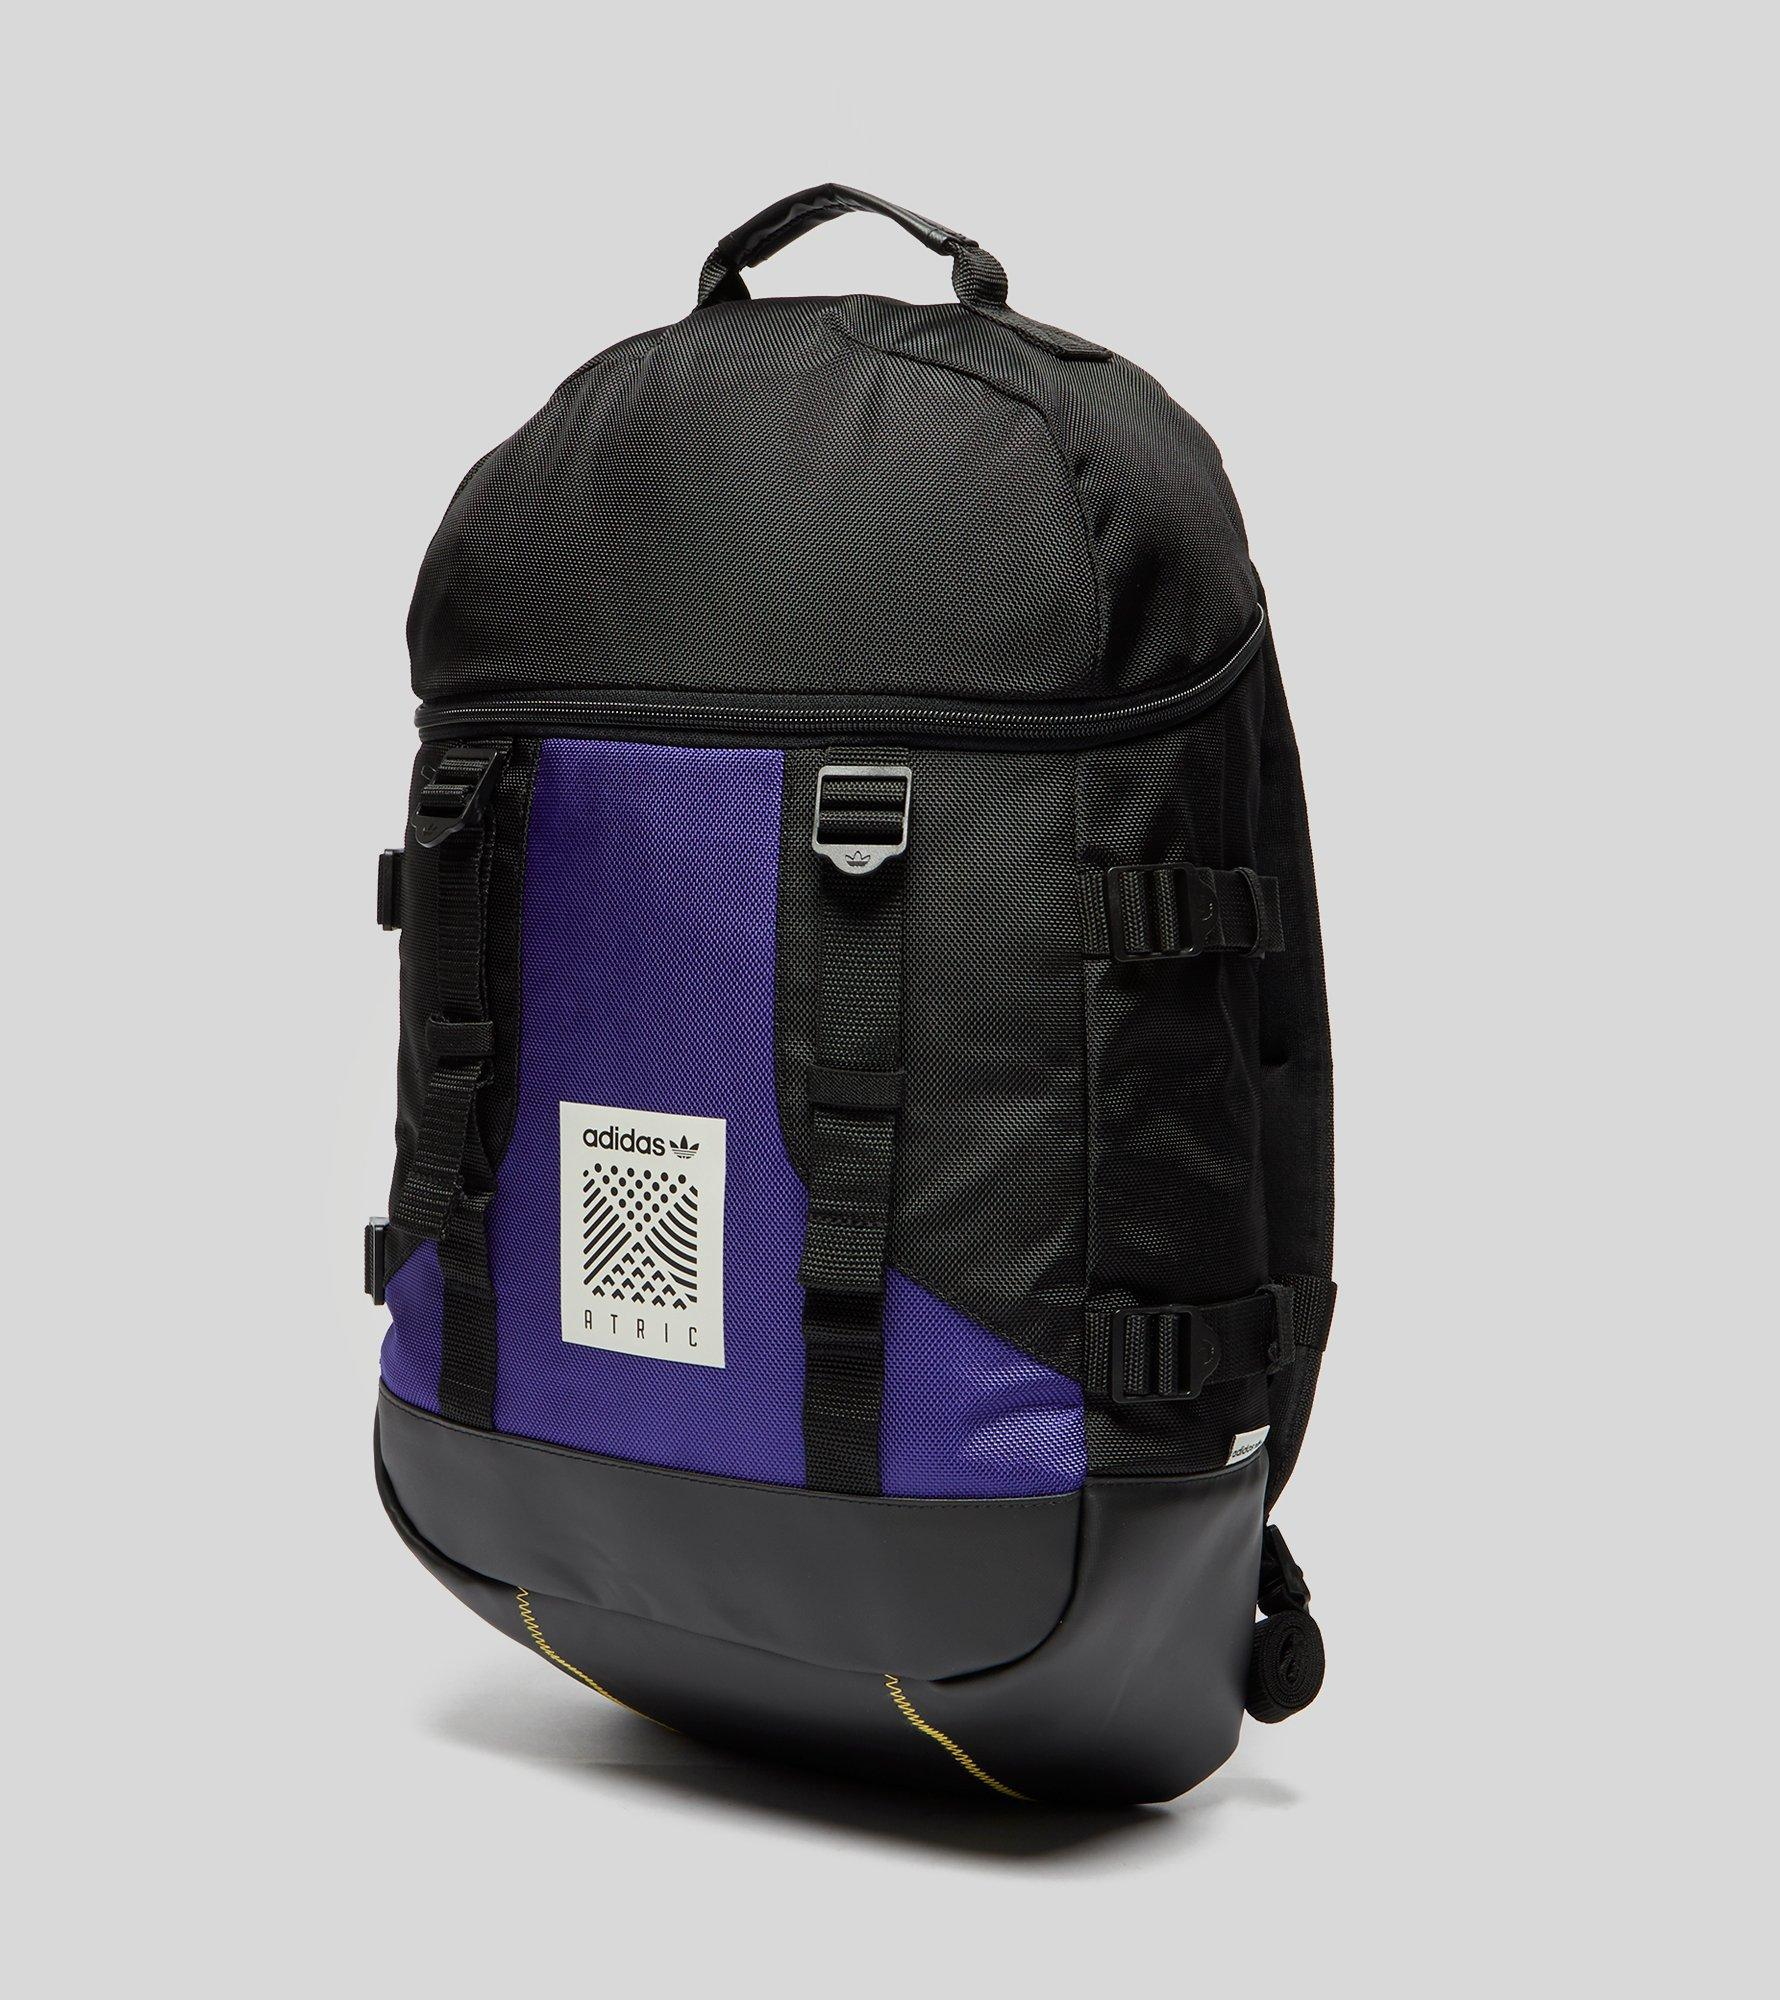 Lyst - adidas Originals Atric Backpack in Black baf560d84cc10